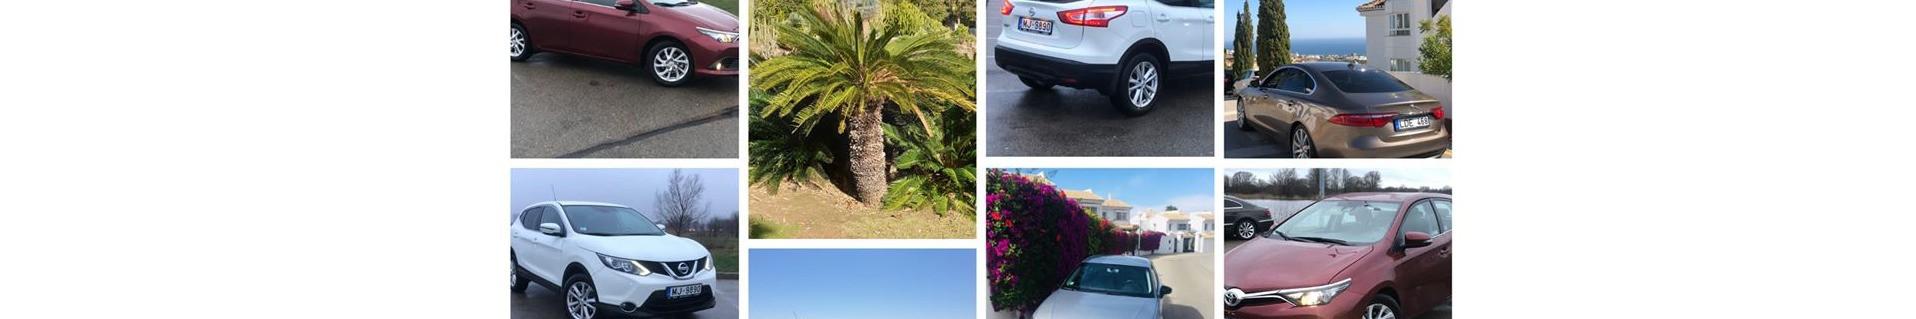 Car Rent Marbella - Прокат автомобилей